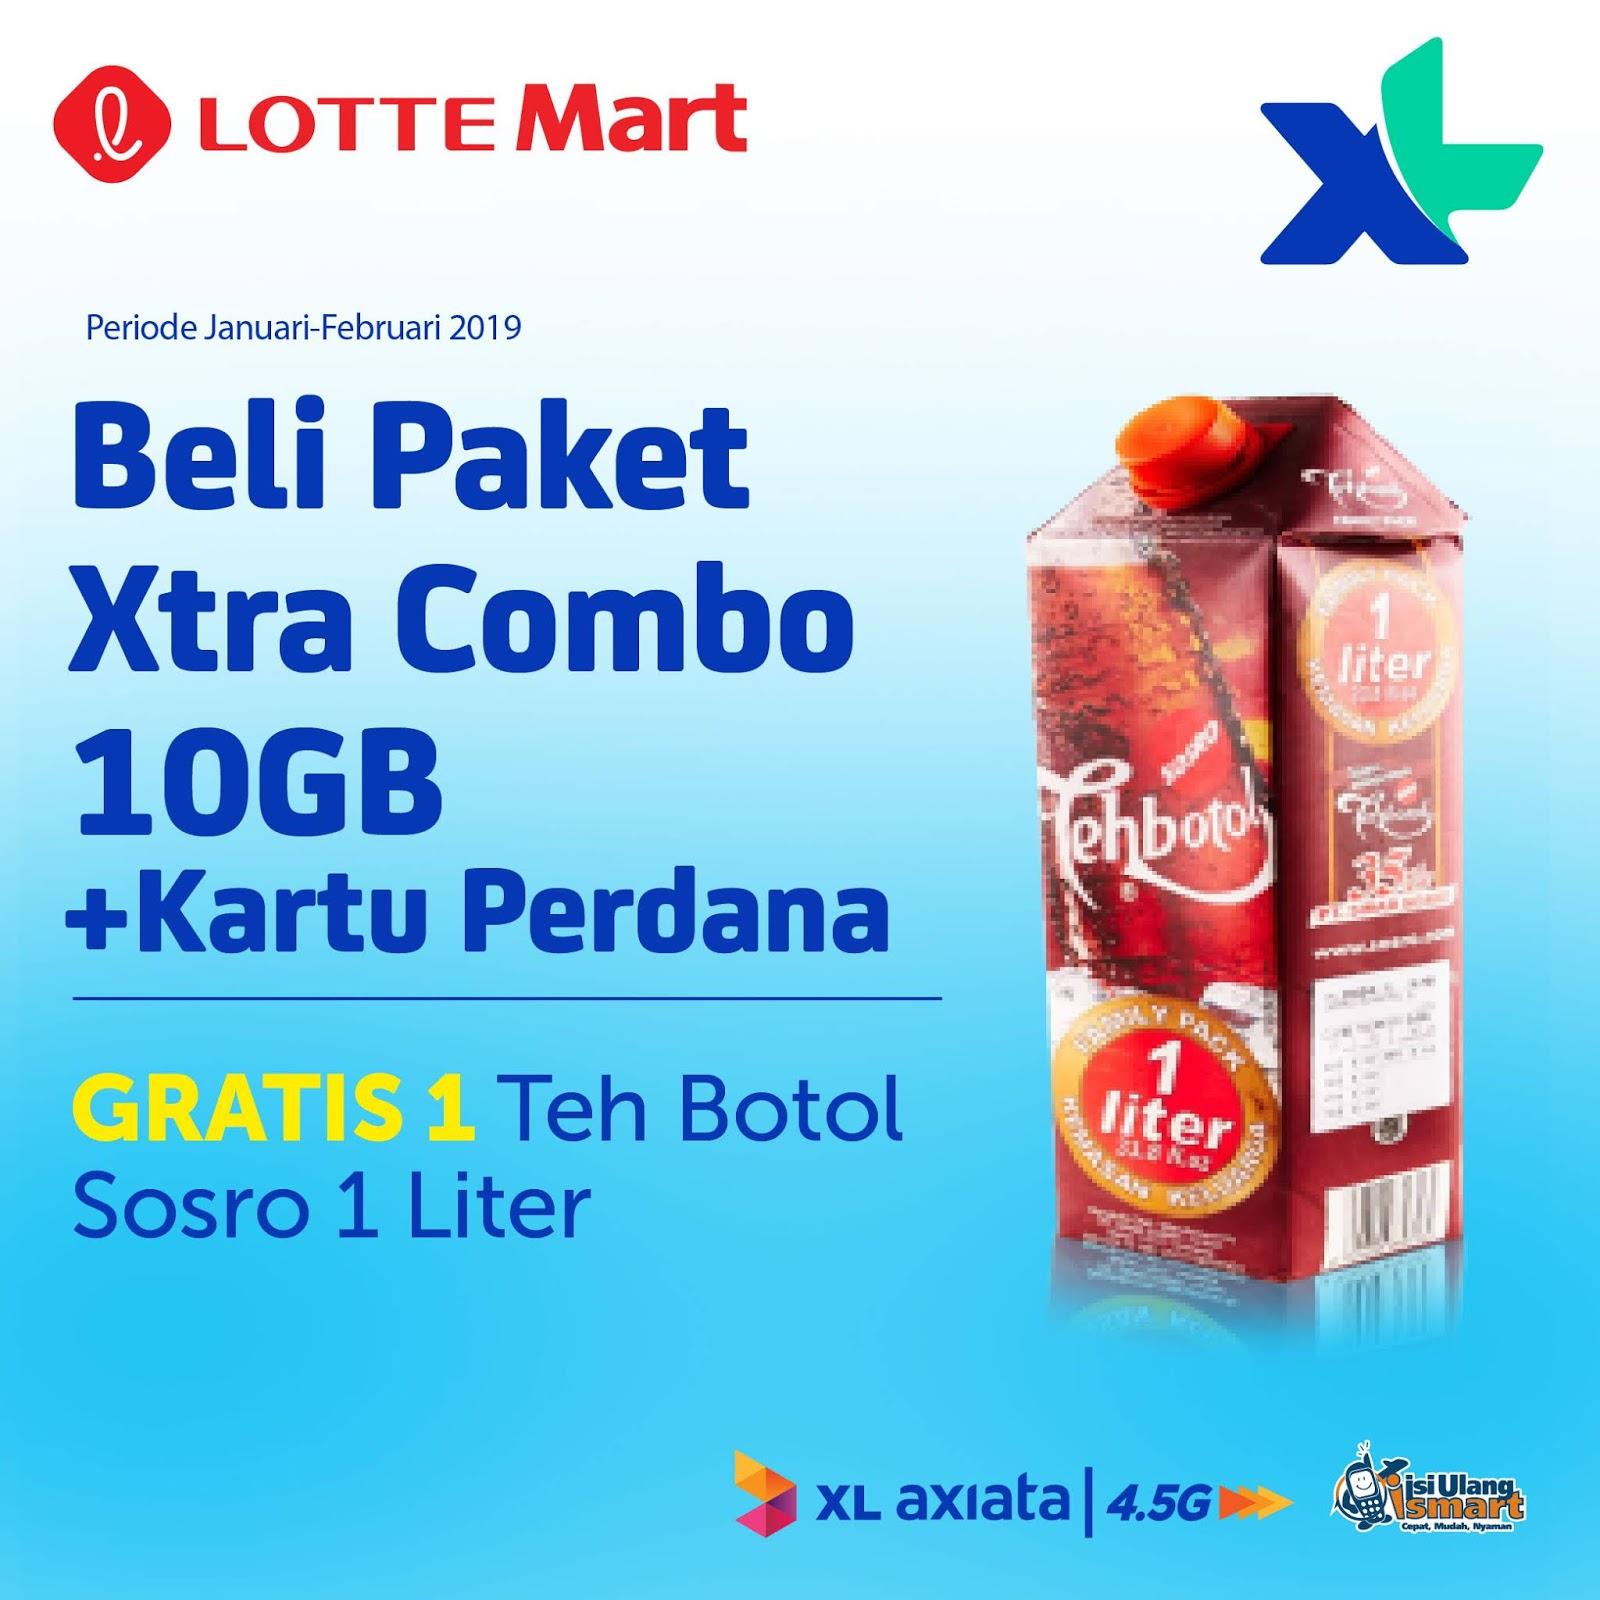 #LotteMart - #Promo Beli Paket XL Xtra Combo 10GB & 20GB Gratis Minuman (s.d 28 Feb 2019)